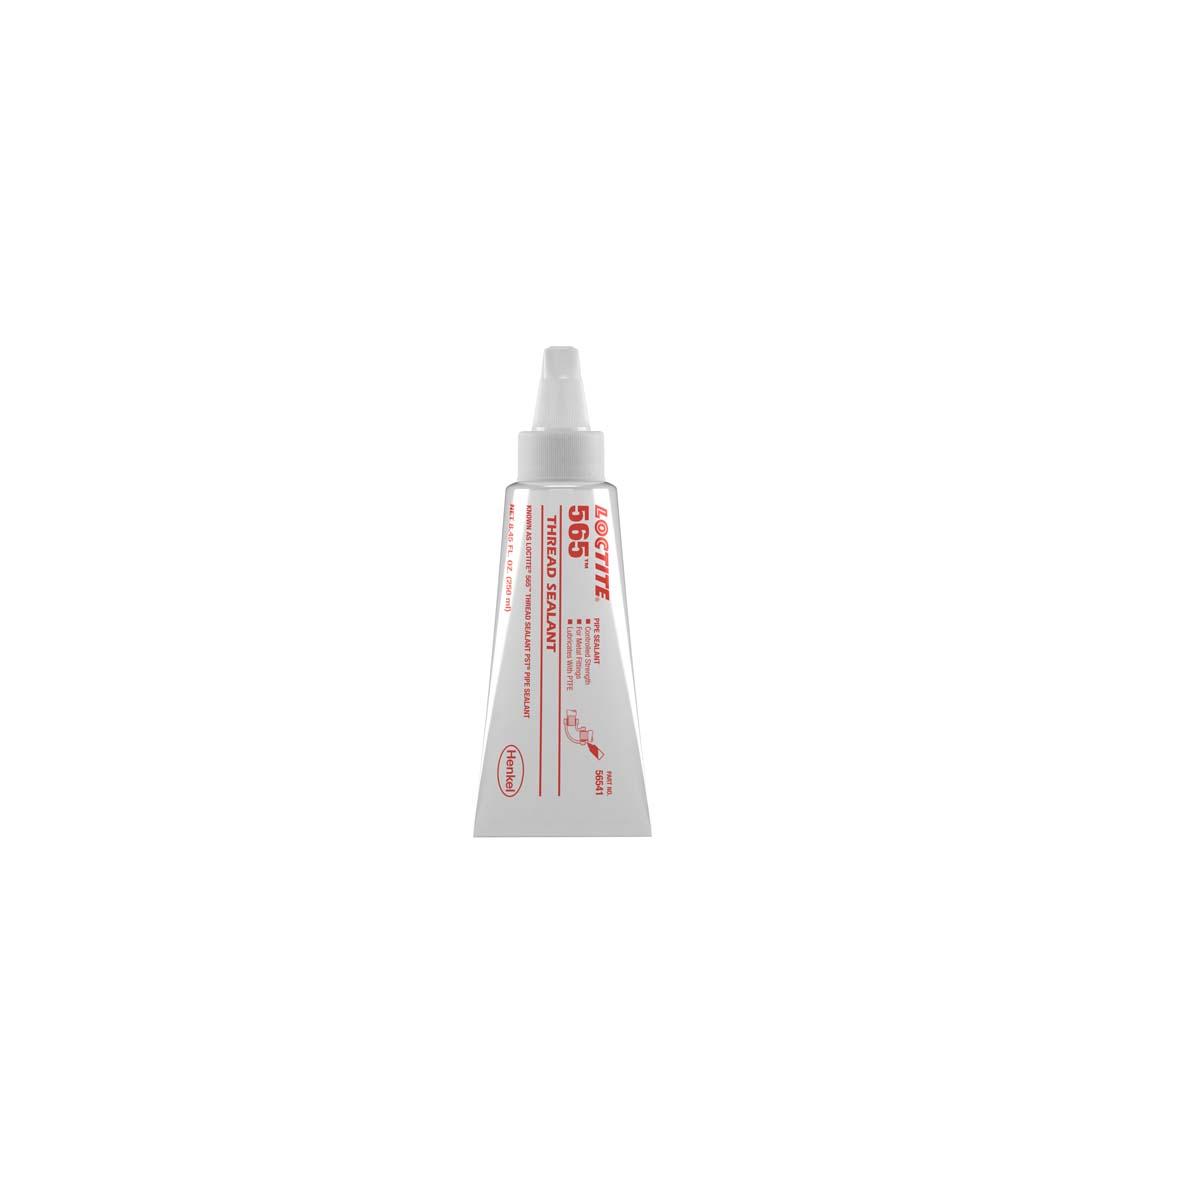 Loctite 565 Low Strength Thread Sealant